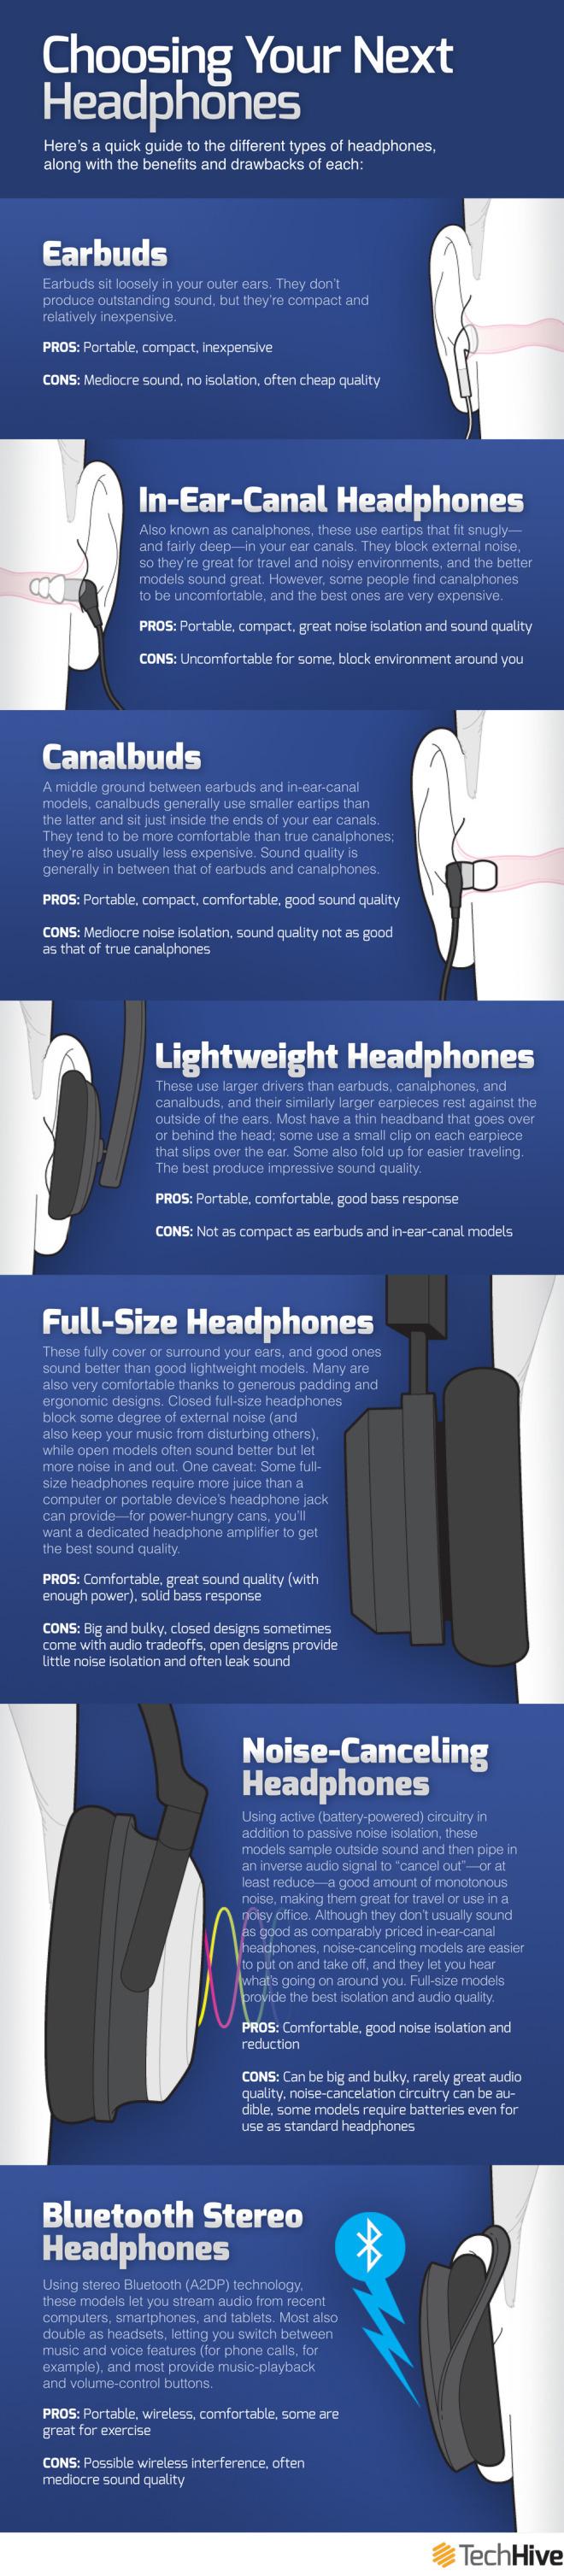 Types of Headphones by TechHive.com